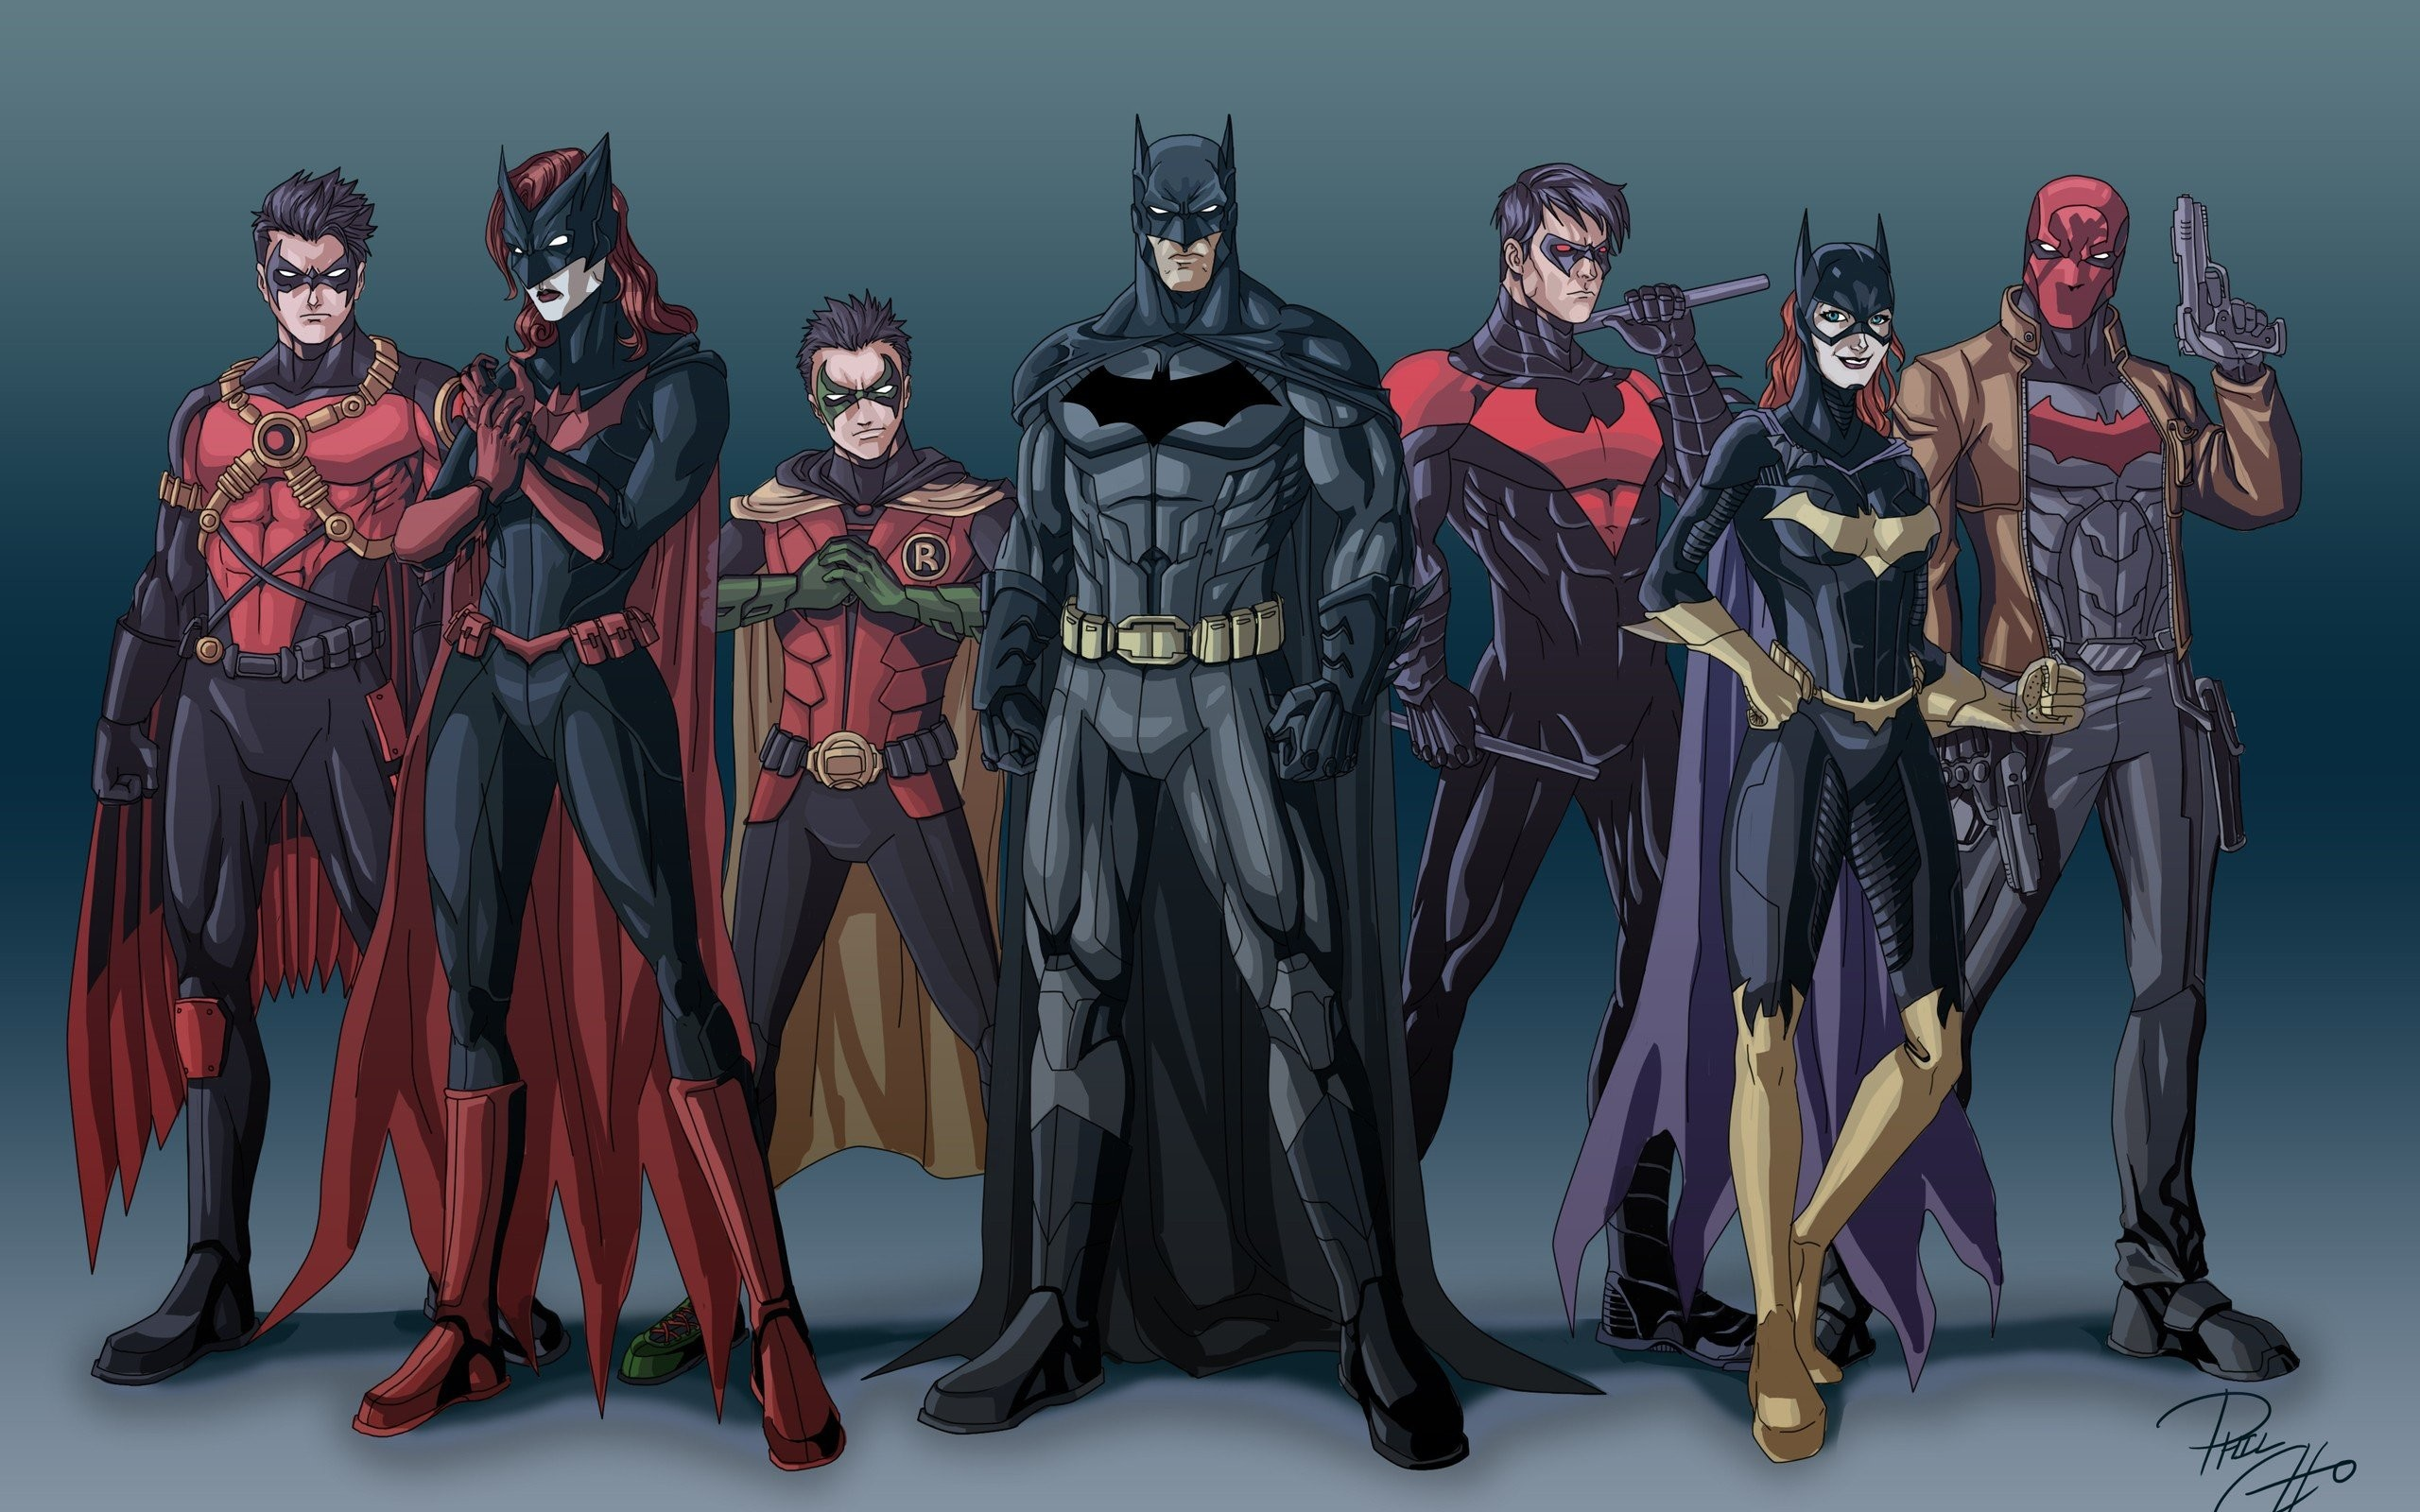 Artwork Batgirl Batman Batwoman Comics Dc Justice League Nightwing Red Hood  Robin Suit Superheroes